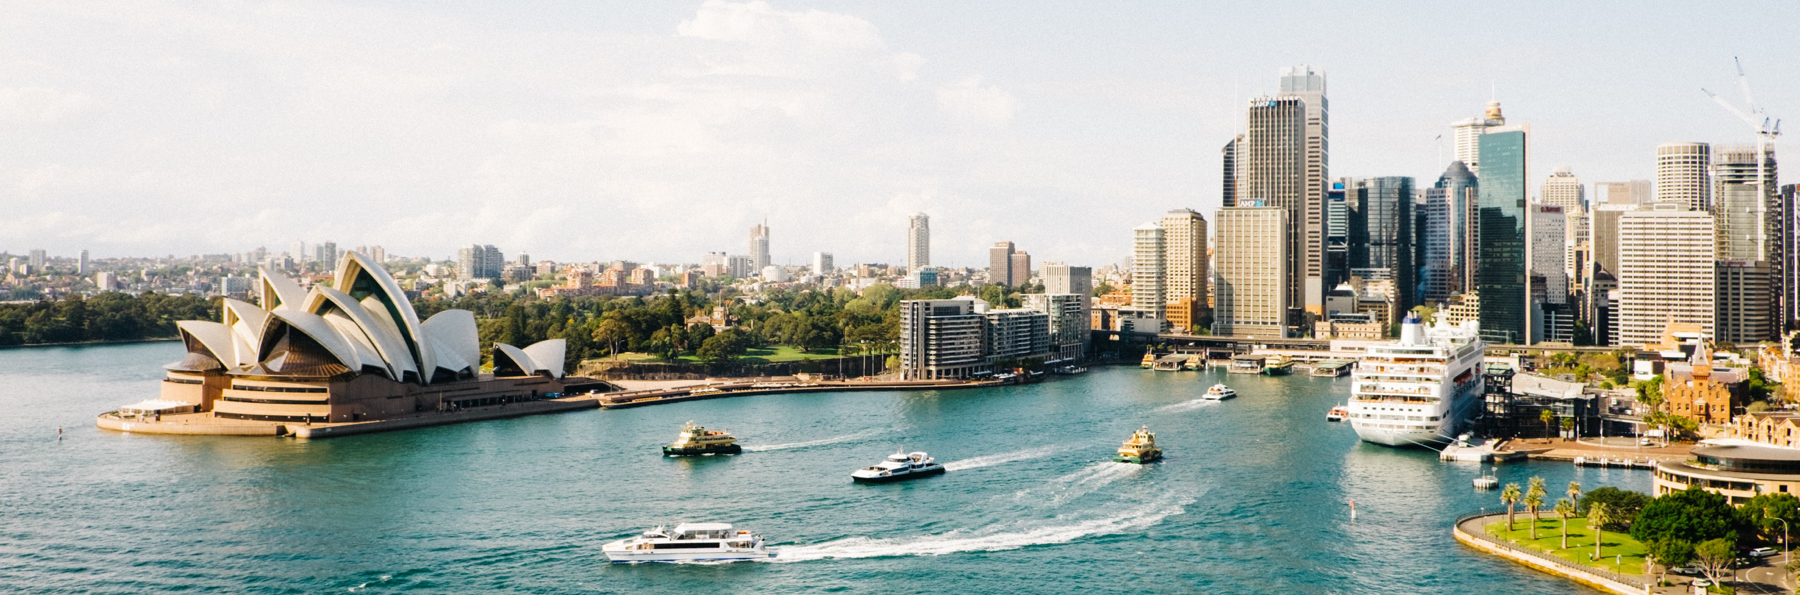 User Insight, Sydney, Australia.